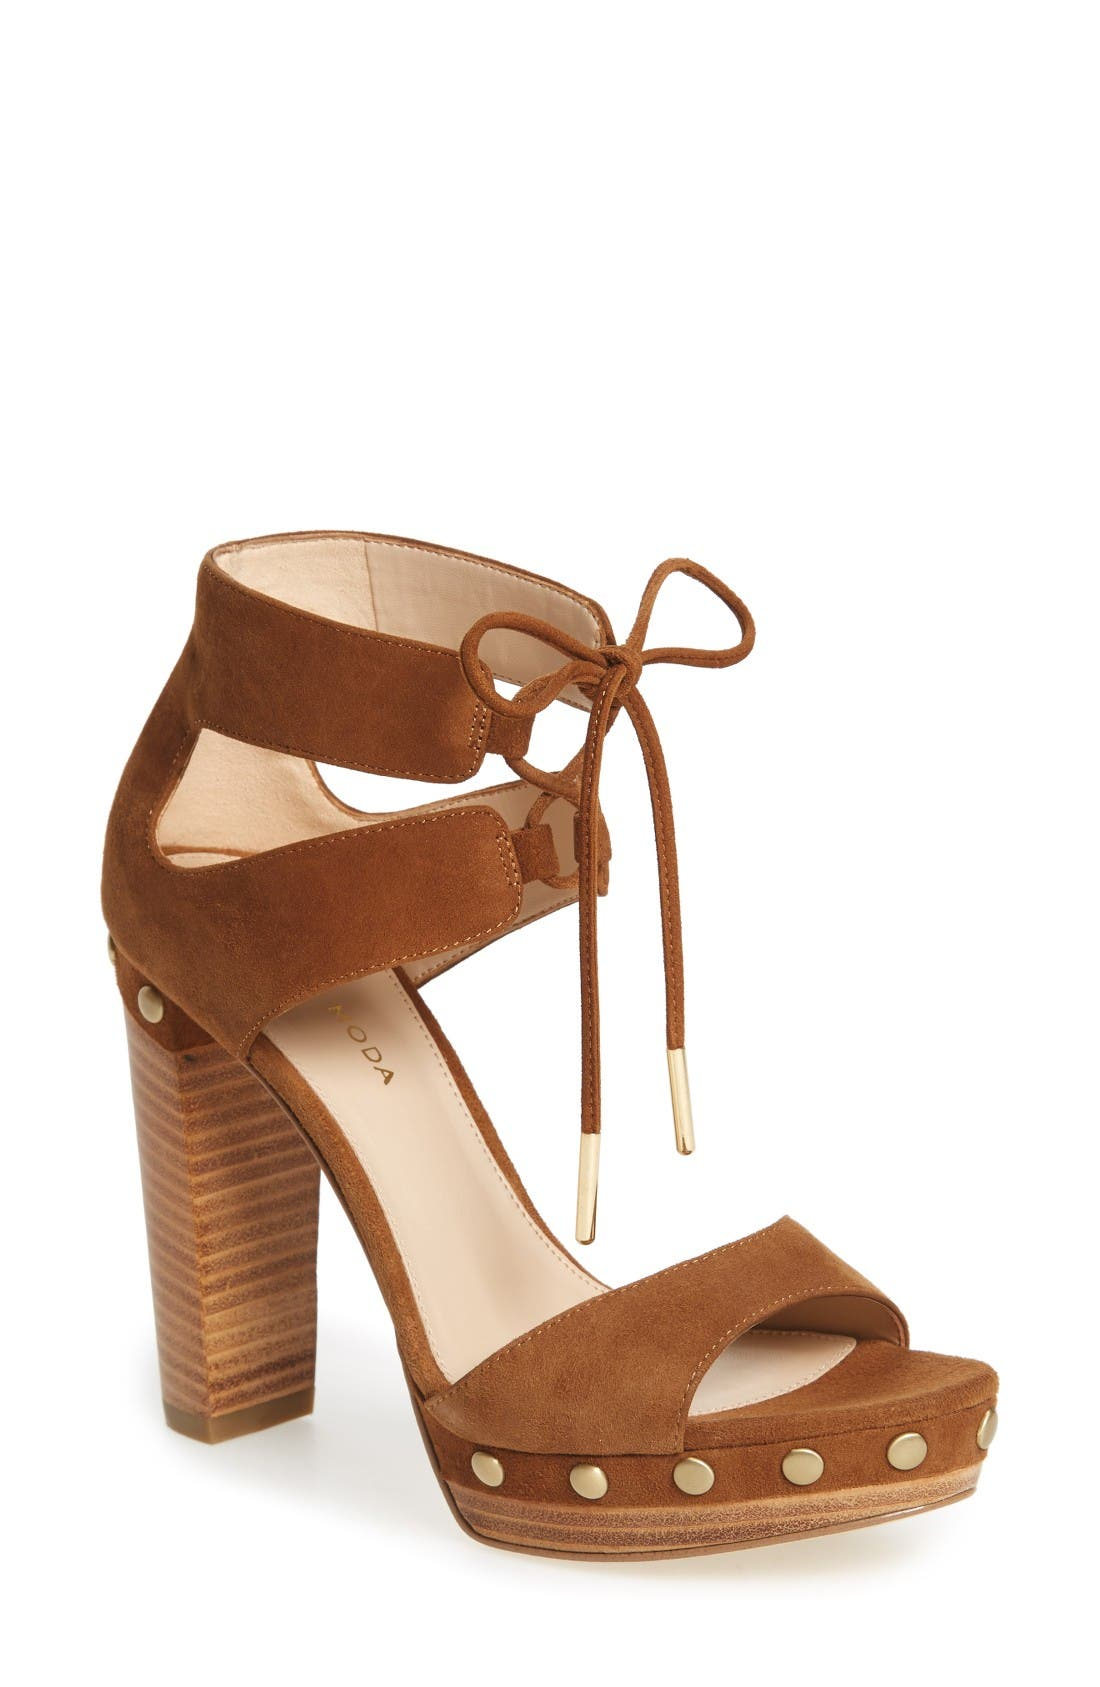 Alternate Image 1 Selected - Pelle Moda Pacific Platform Sandal (Women)